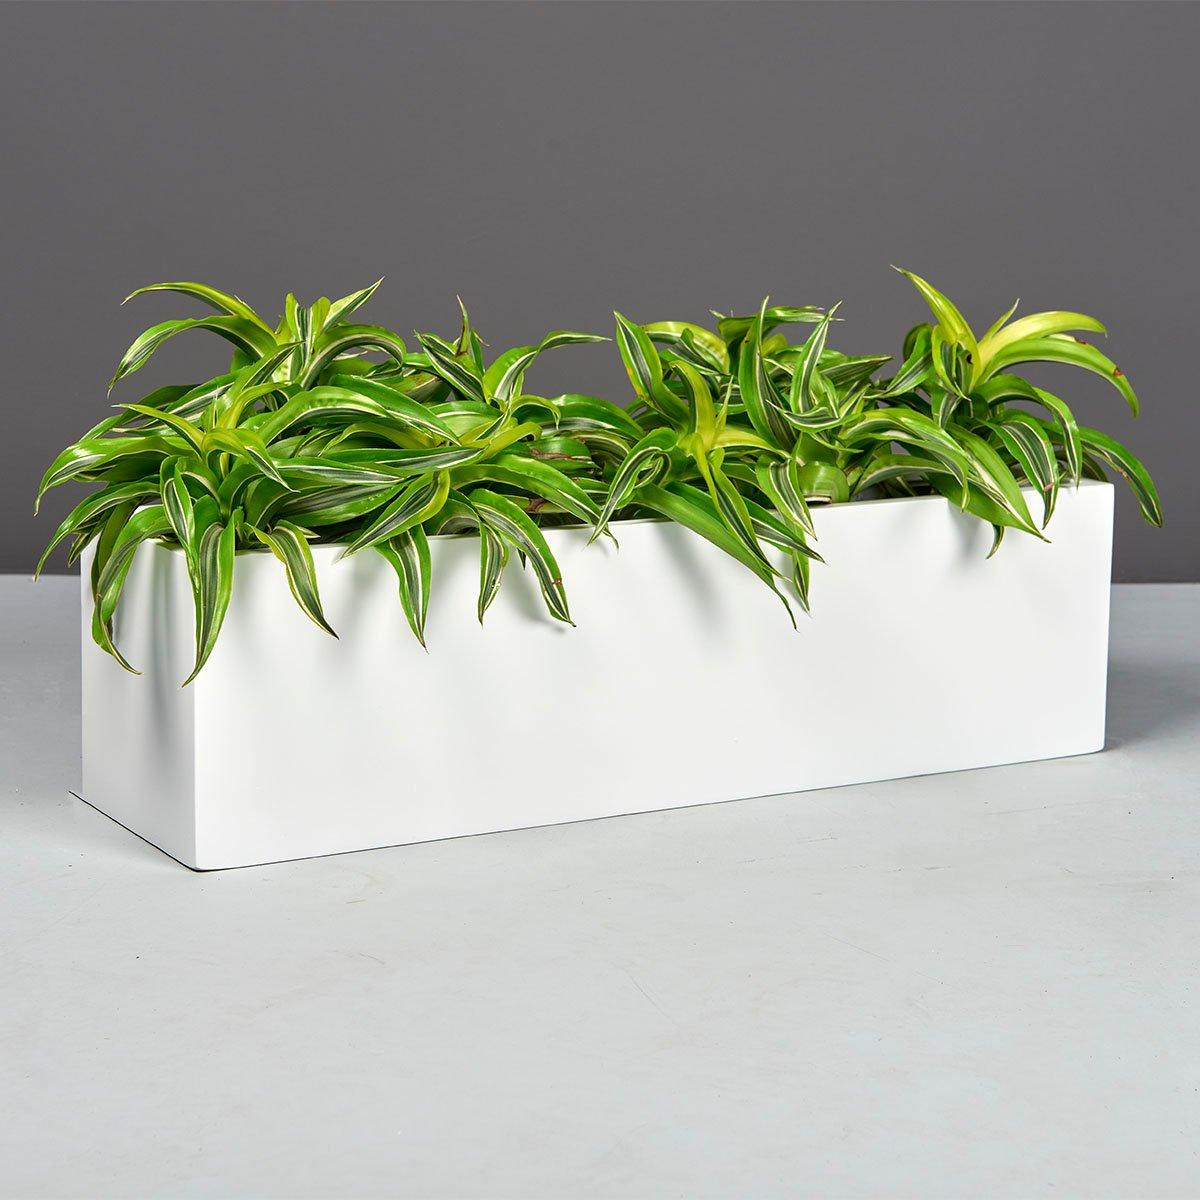 Weir Rectangle Tabletop Planter